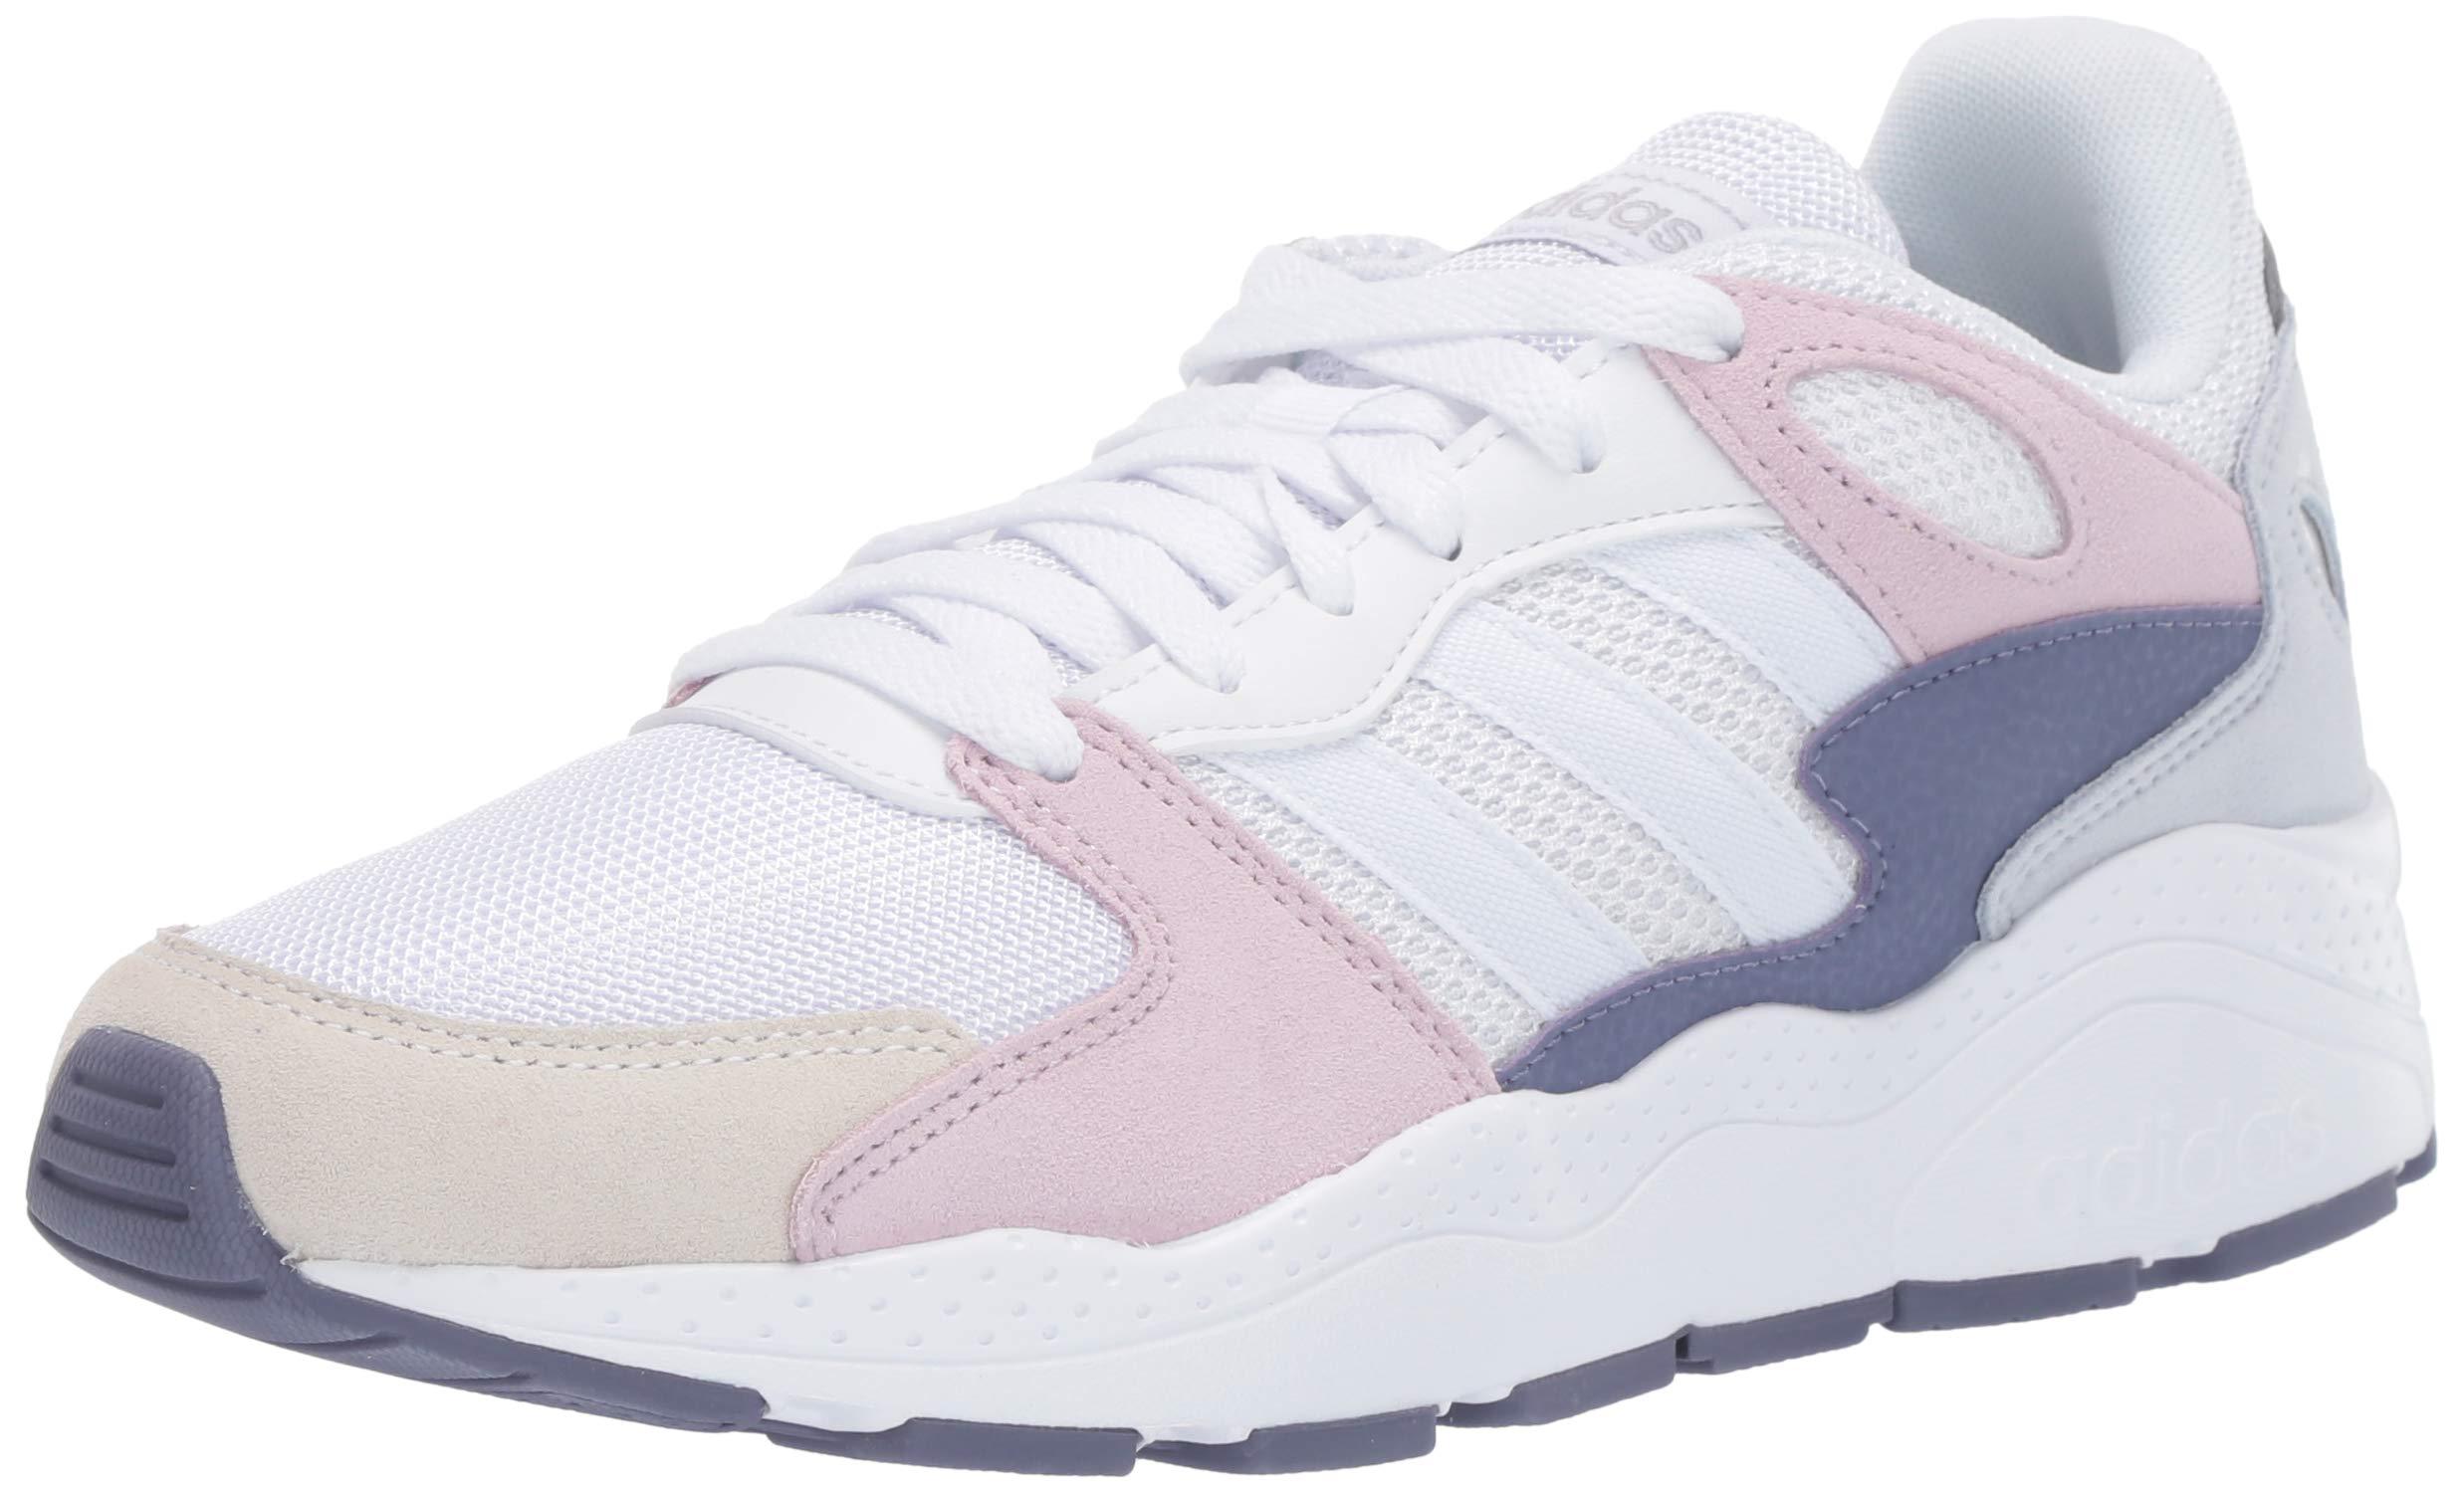 Chaos Sneaker White/aero Pink, 7.5 M